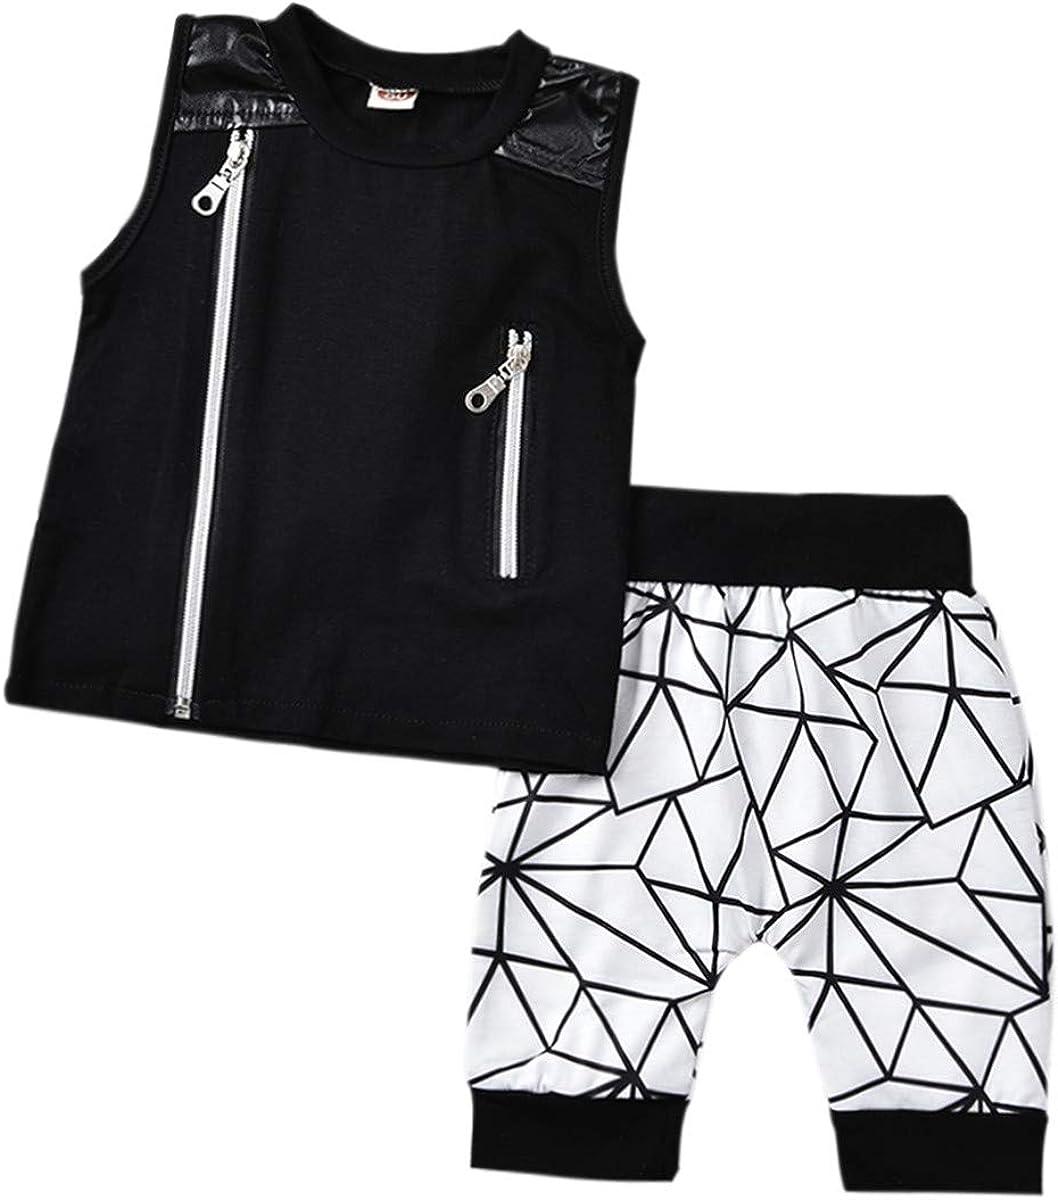 Toddler Baby Boy Outfits Sleeveless Shirt Tops Short Pants Sets Summer Clothes